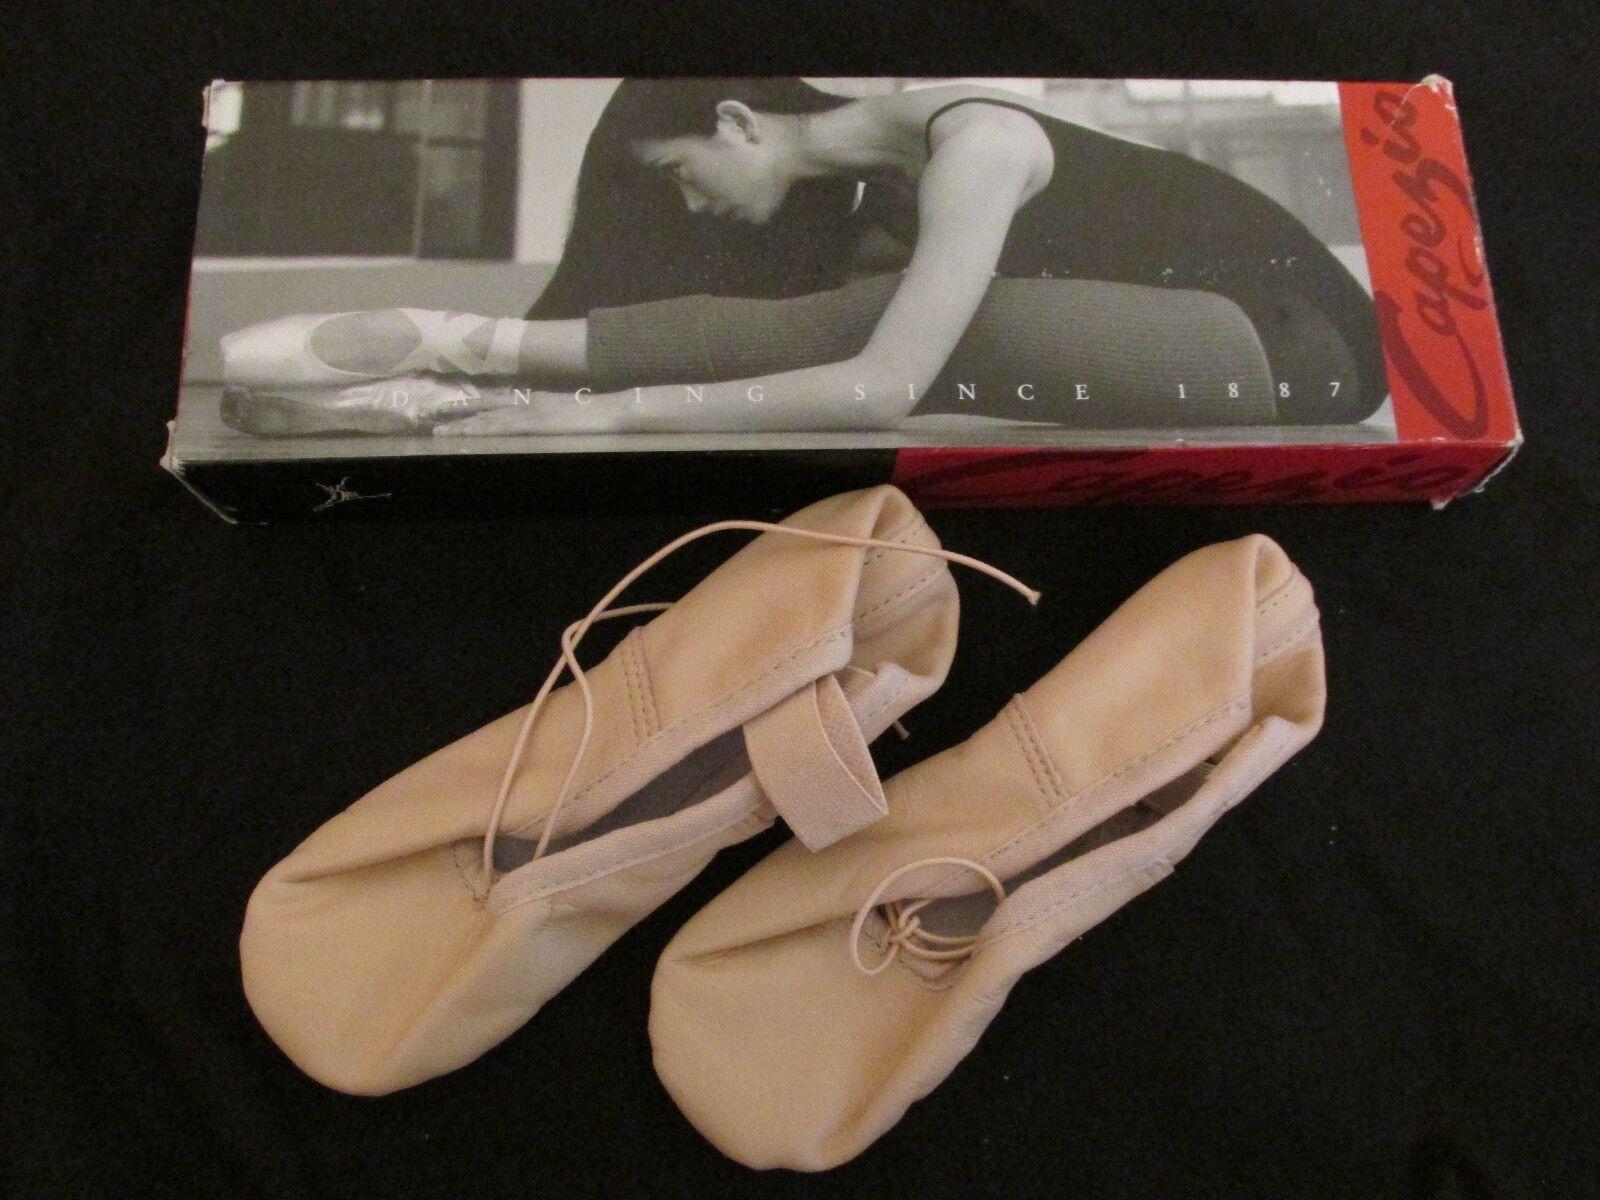 CAPEZIO Love My Shoes Shoe Bag Satin Tasche XXL f Schuhe o Yogamatte pink rosa